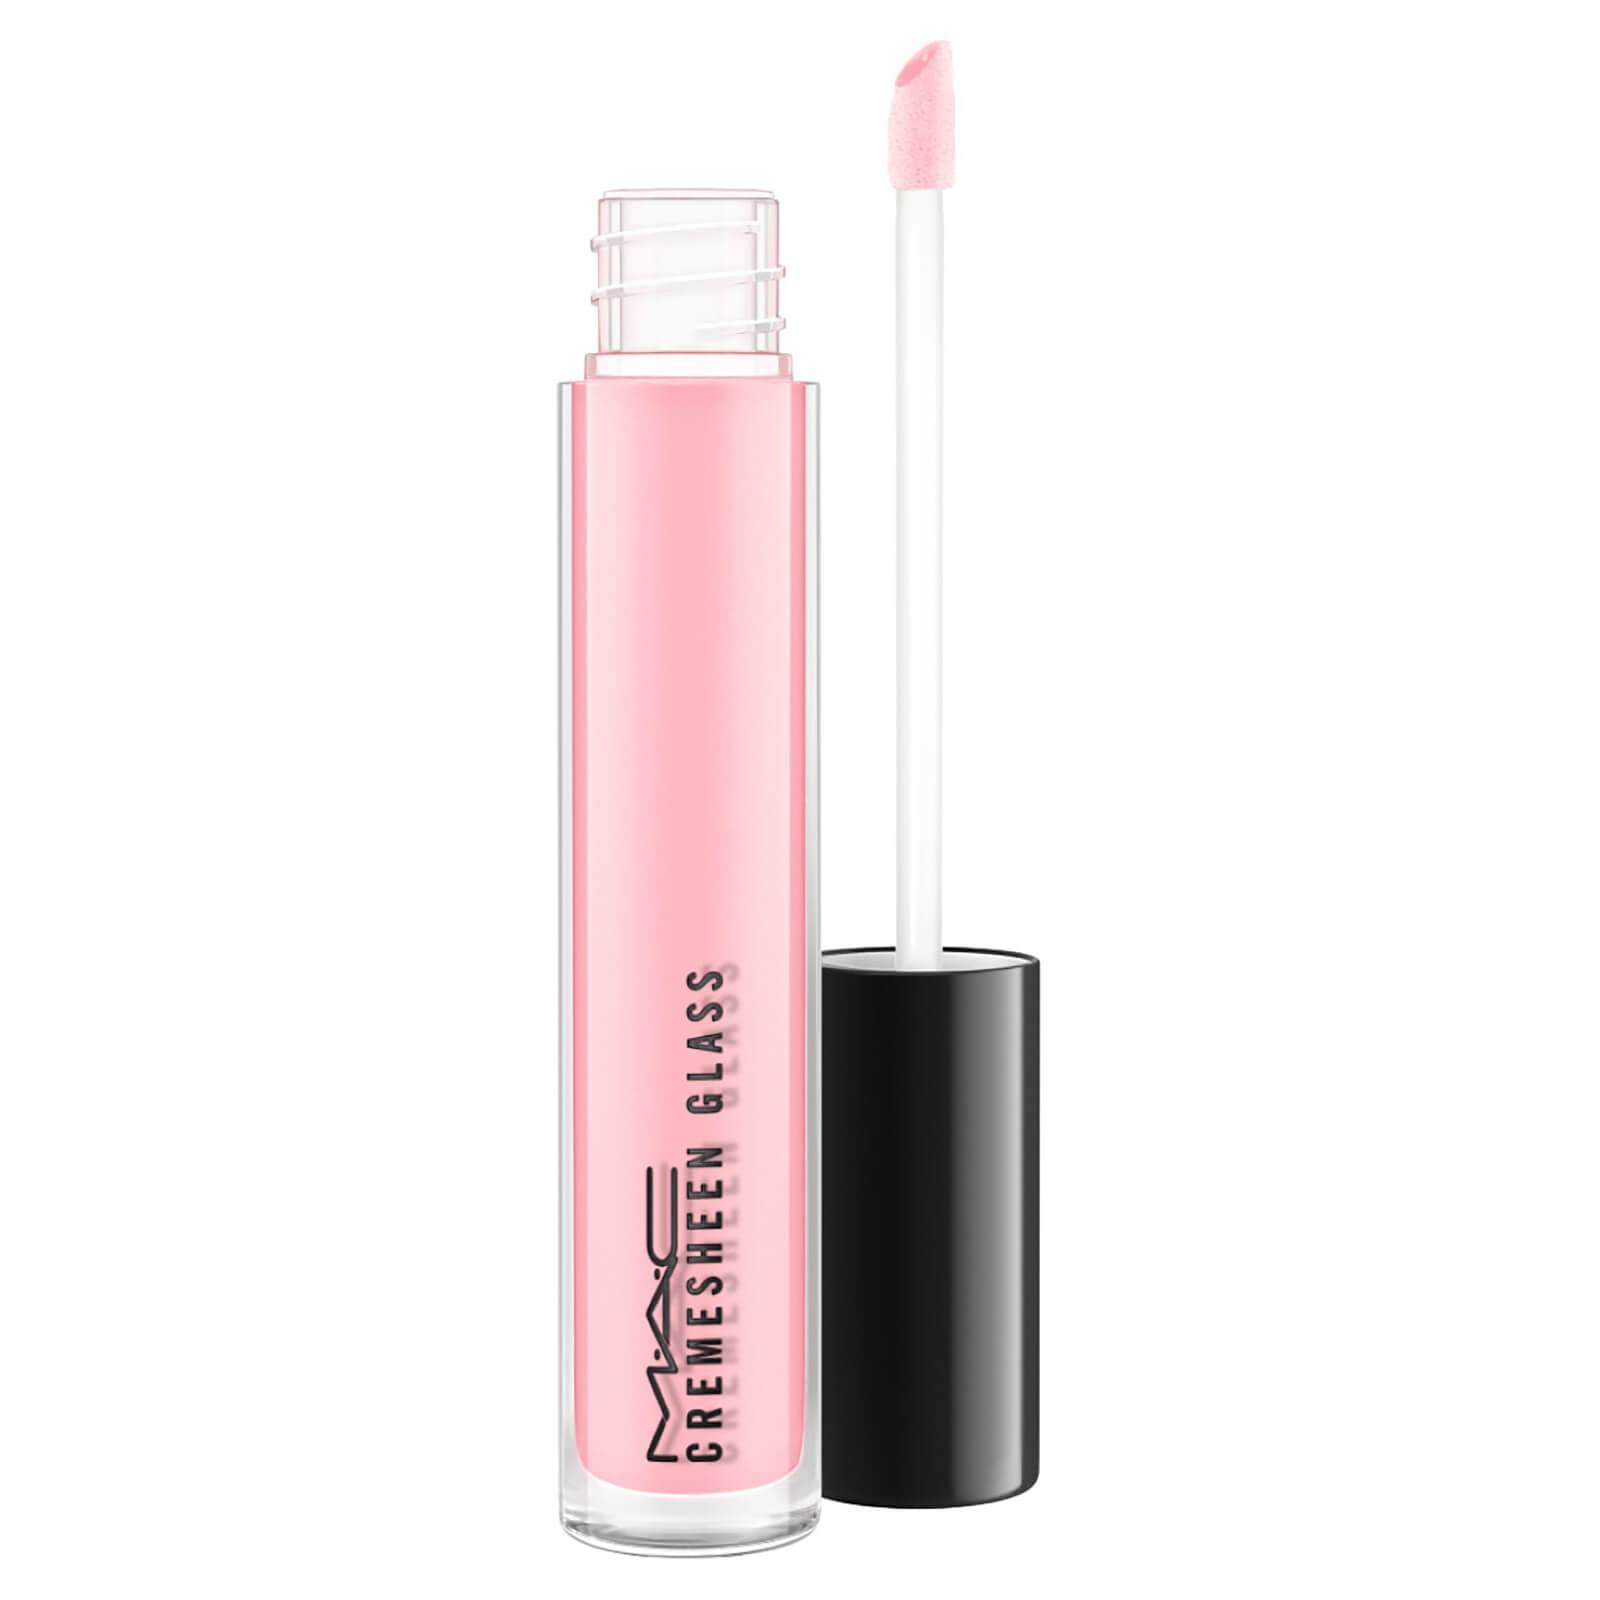 MAC Brillant à Lèvres Cremesheen Glass Lip Finish (teintes variées) - Fashion Scoop